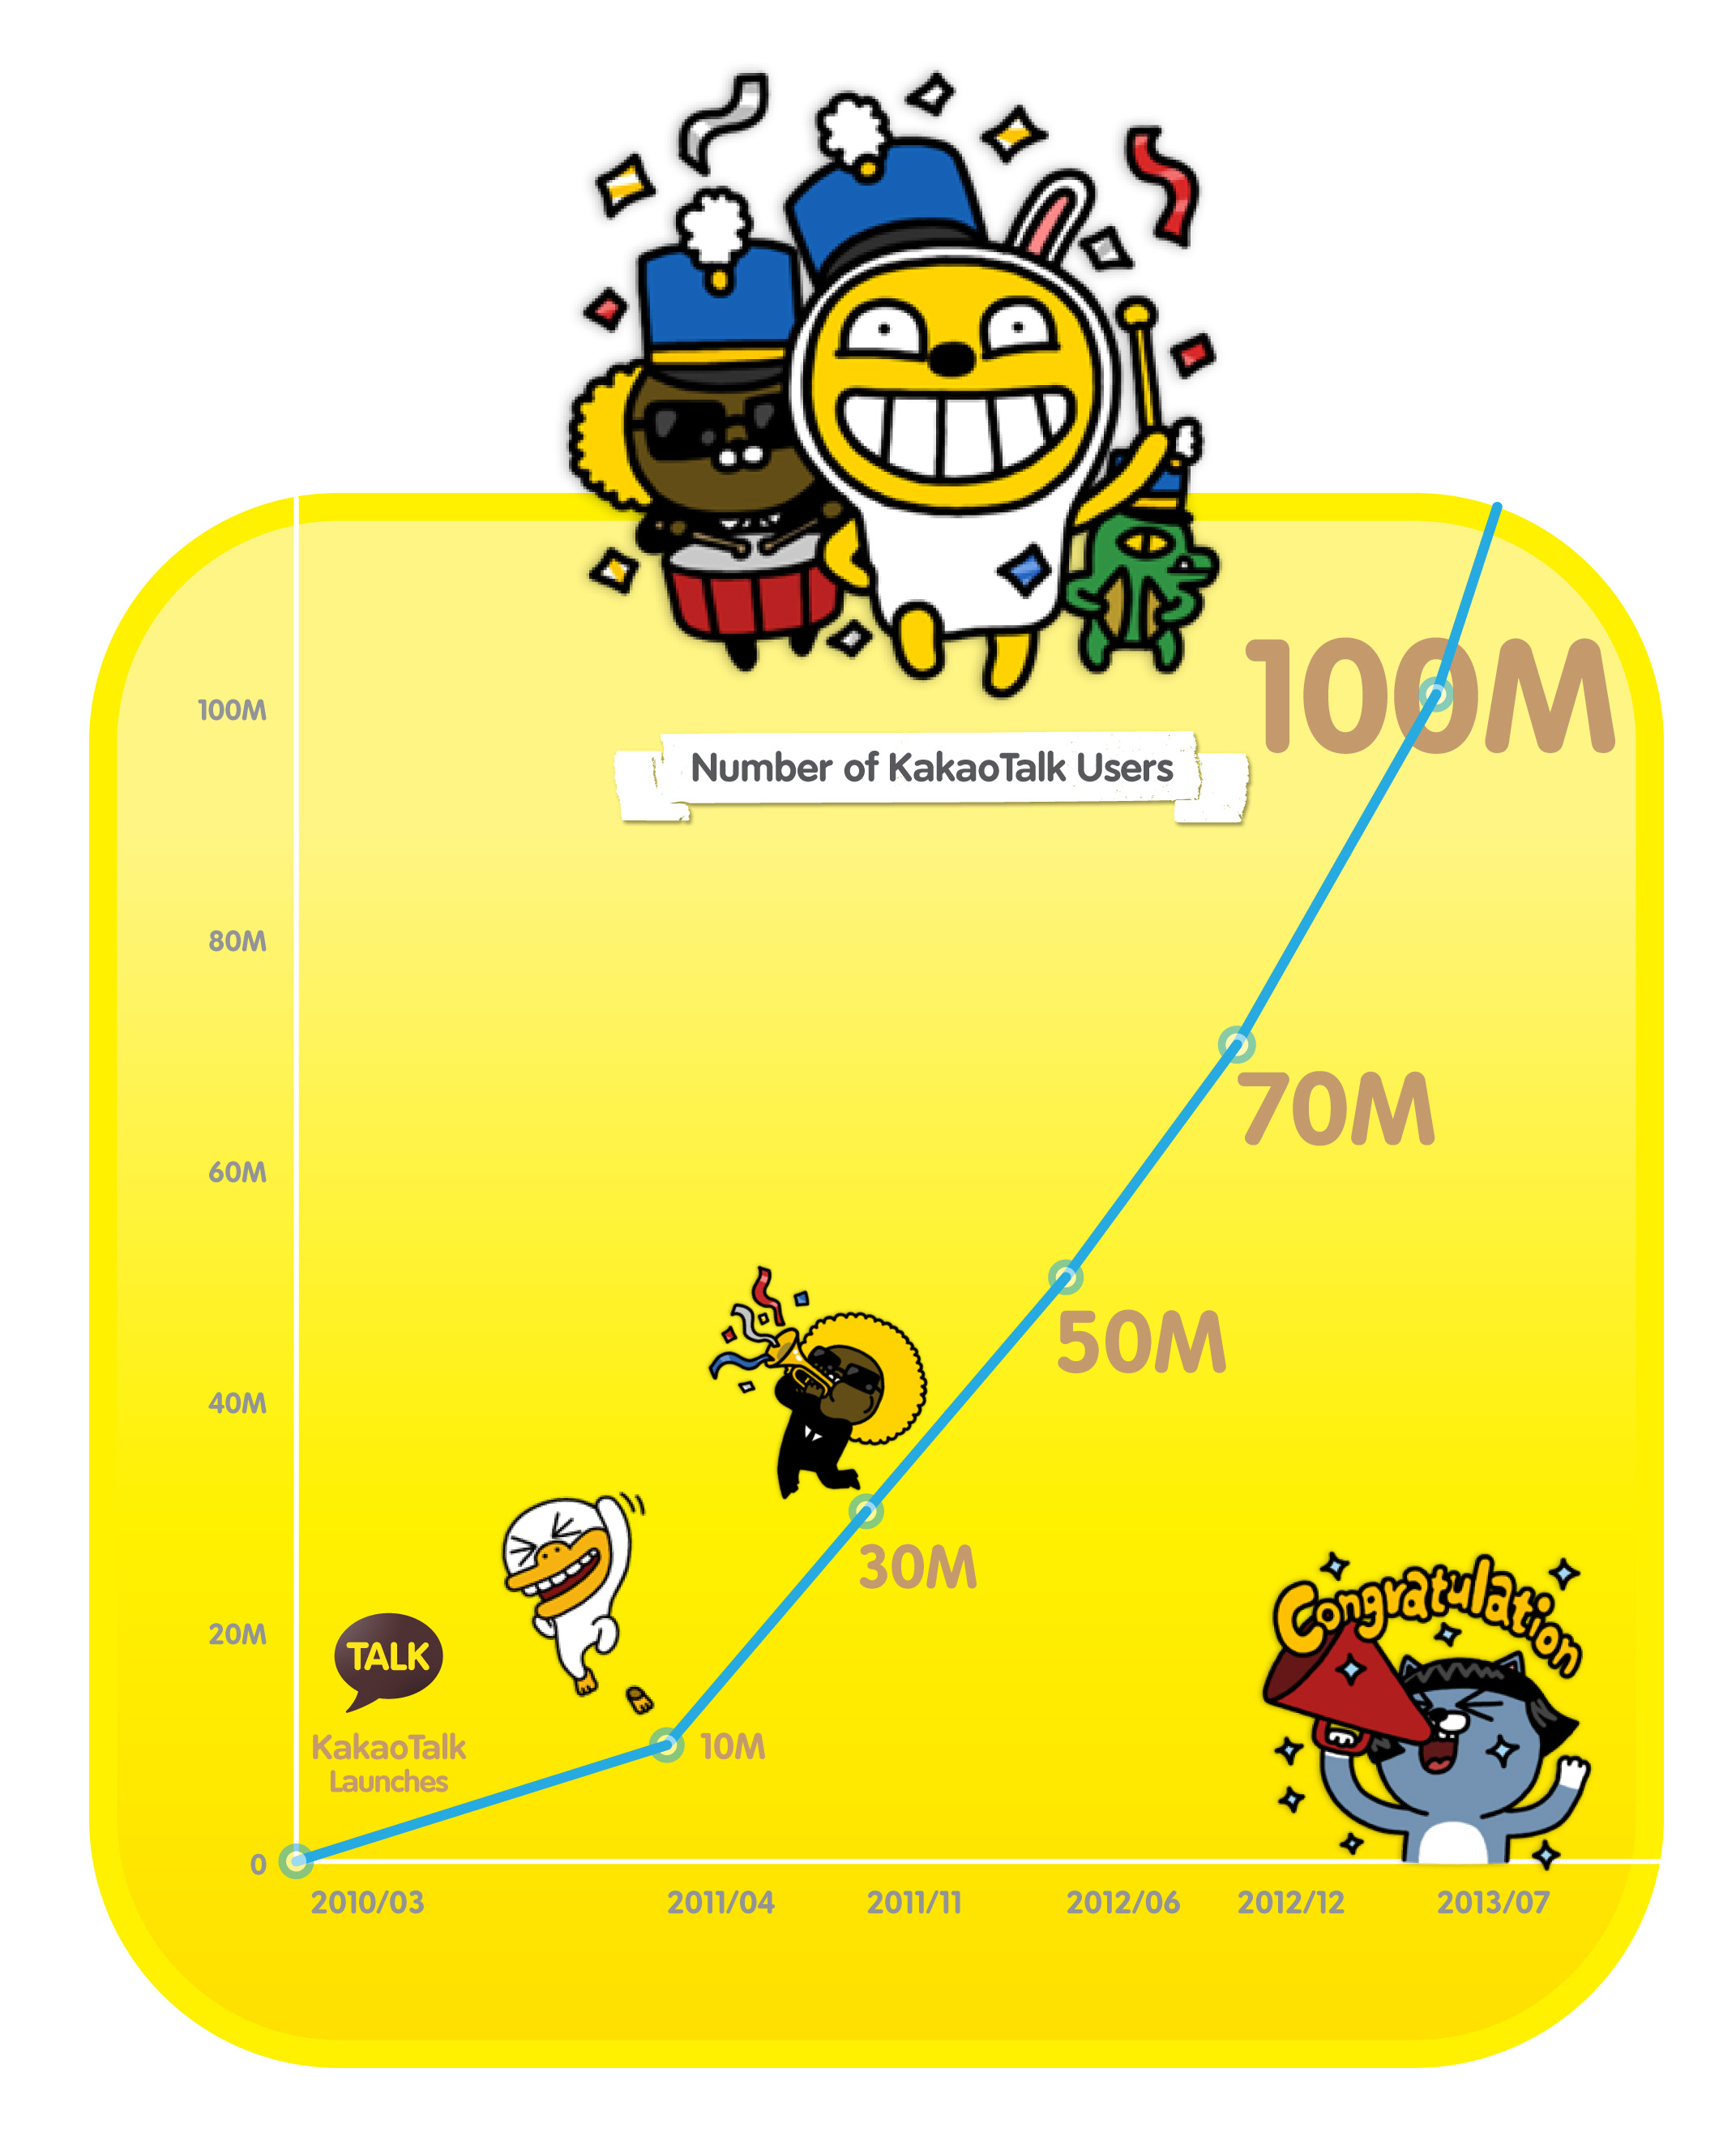 Graph] KakaoTalk Passes 100M Users